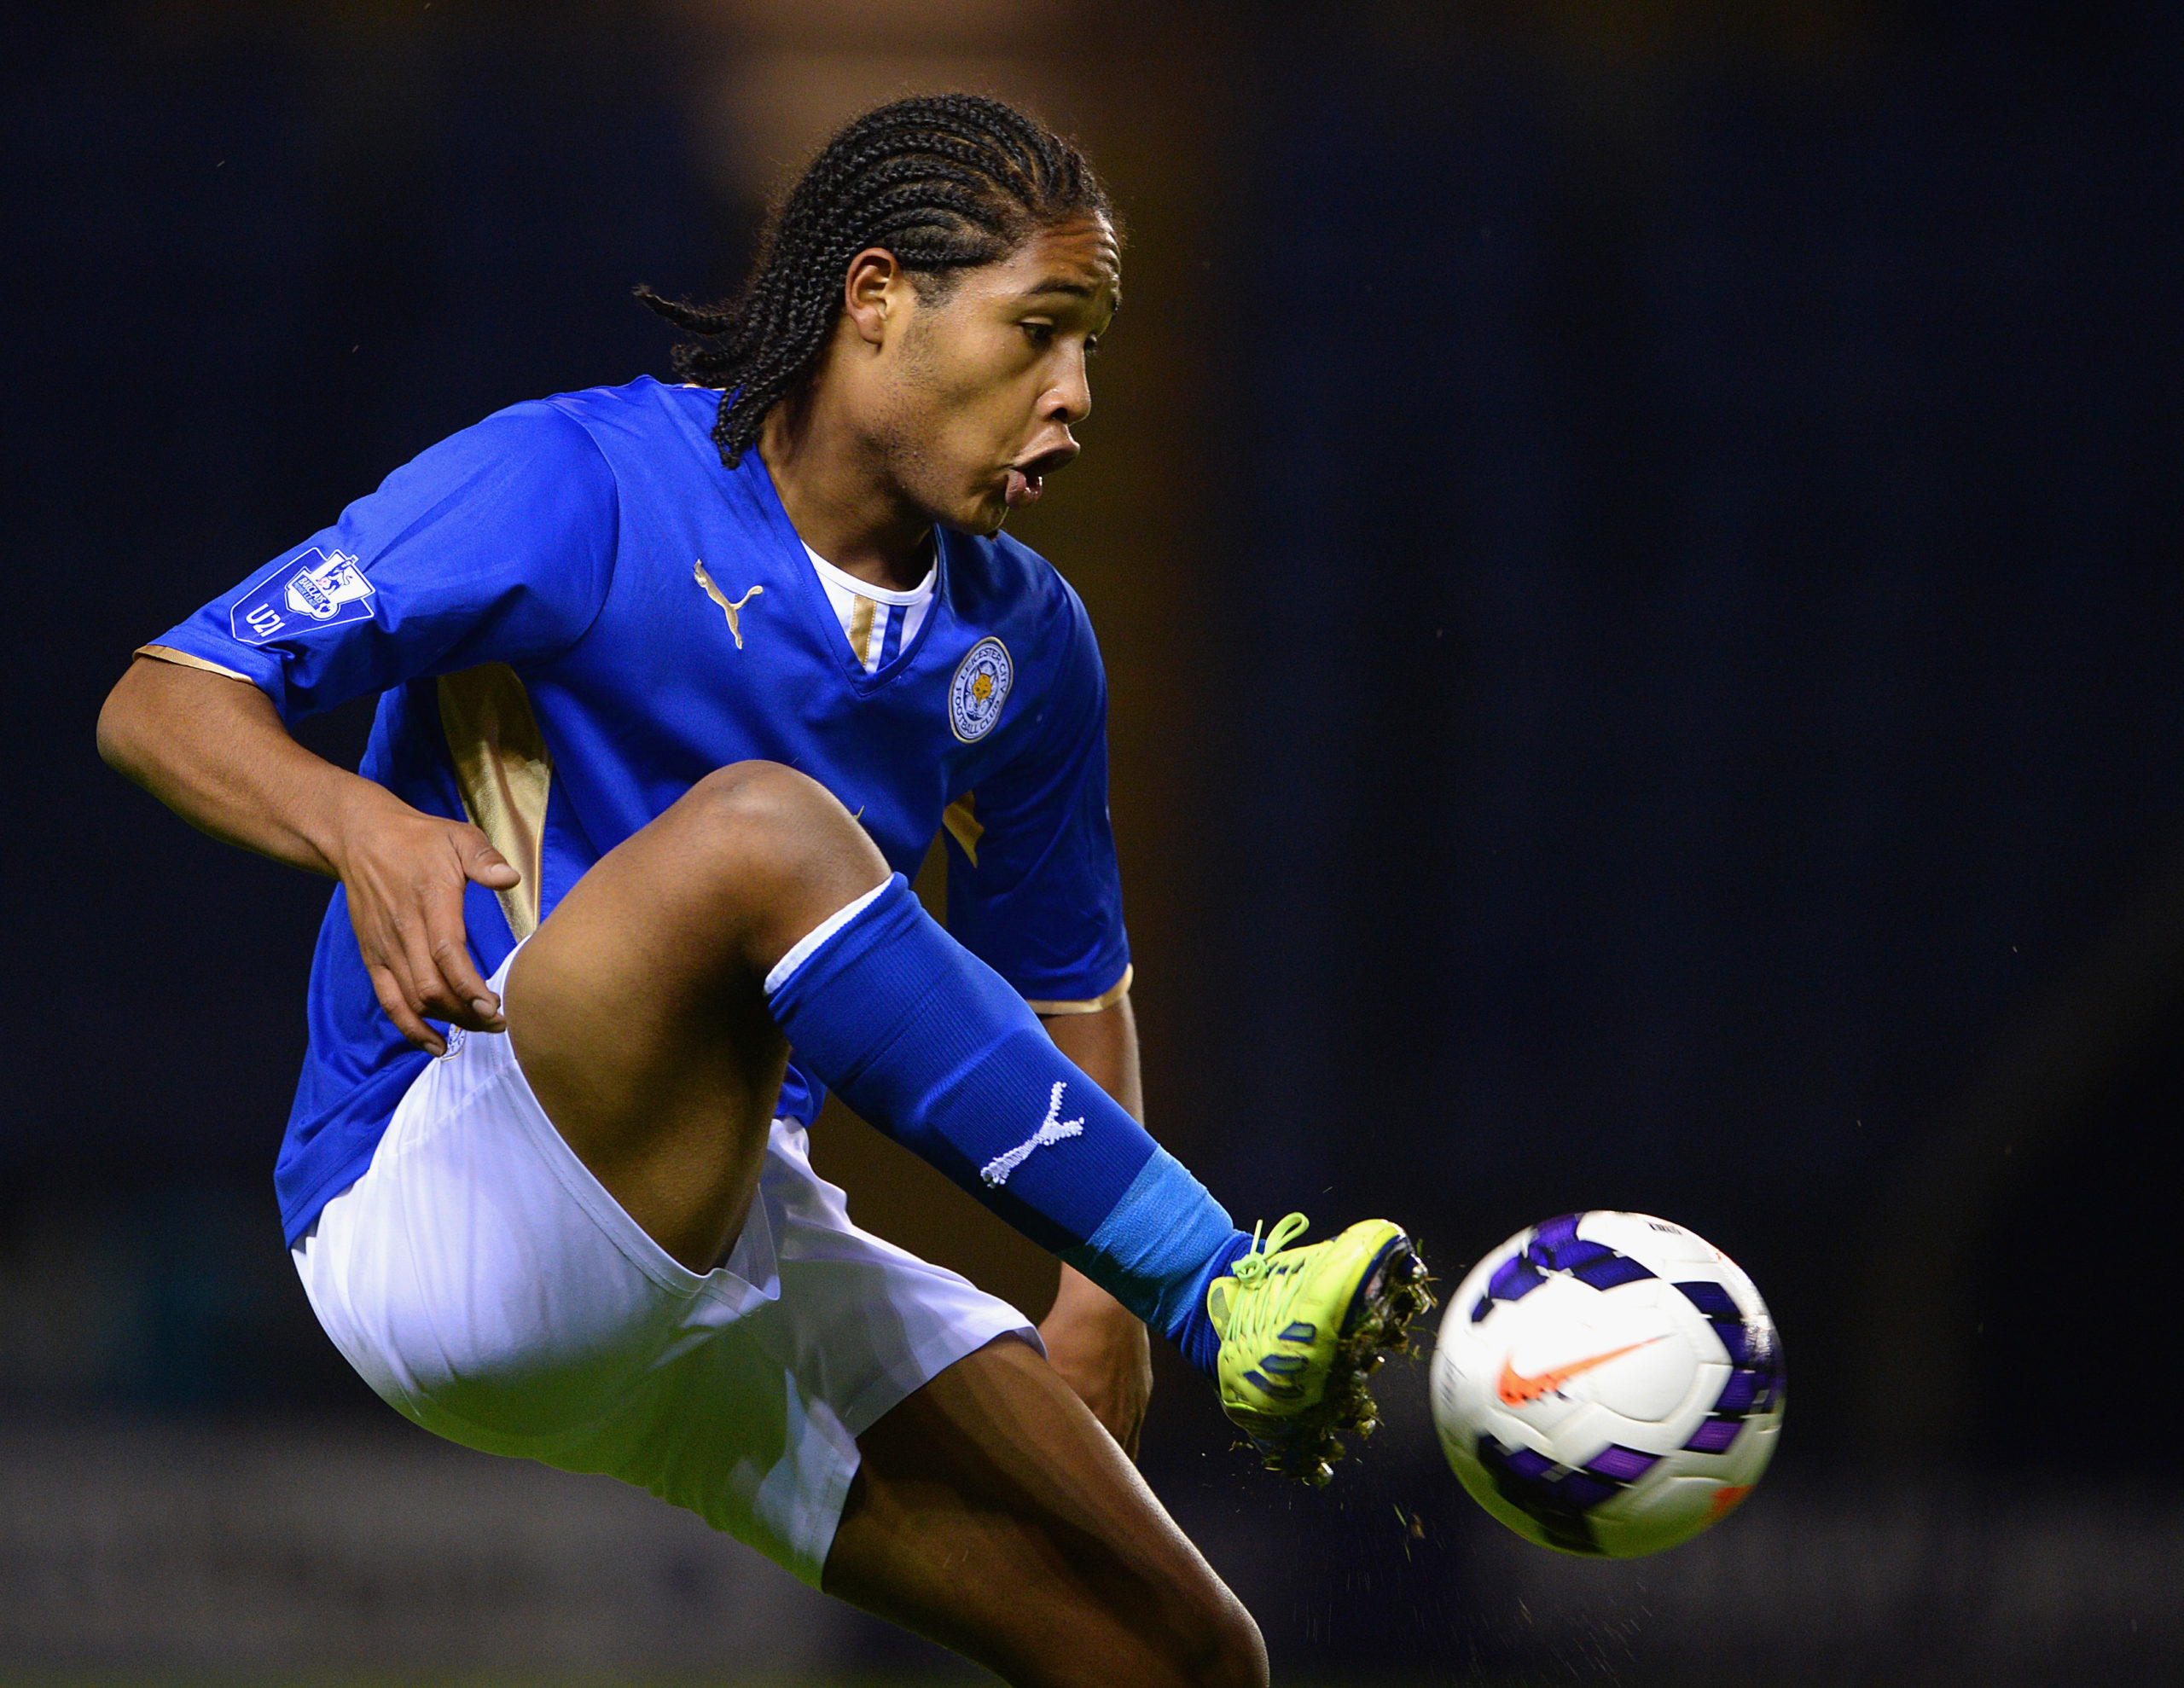 Leicester City U21 v Blackburn Rovers U21 - Barclays U21 Premier League